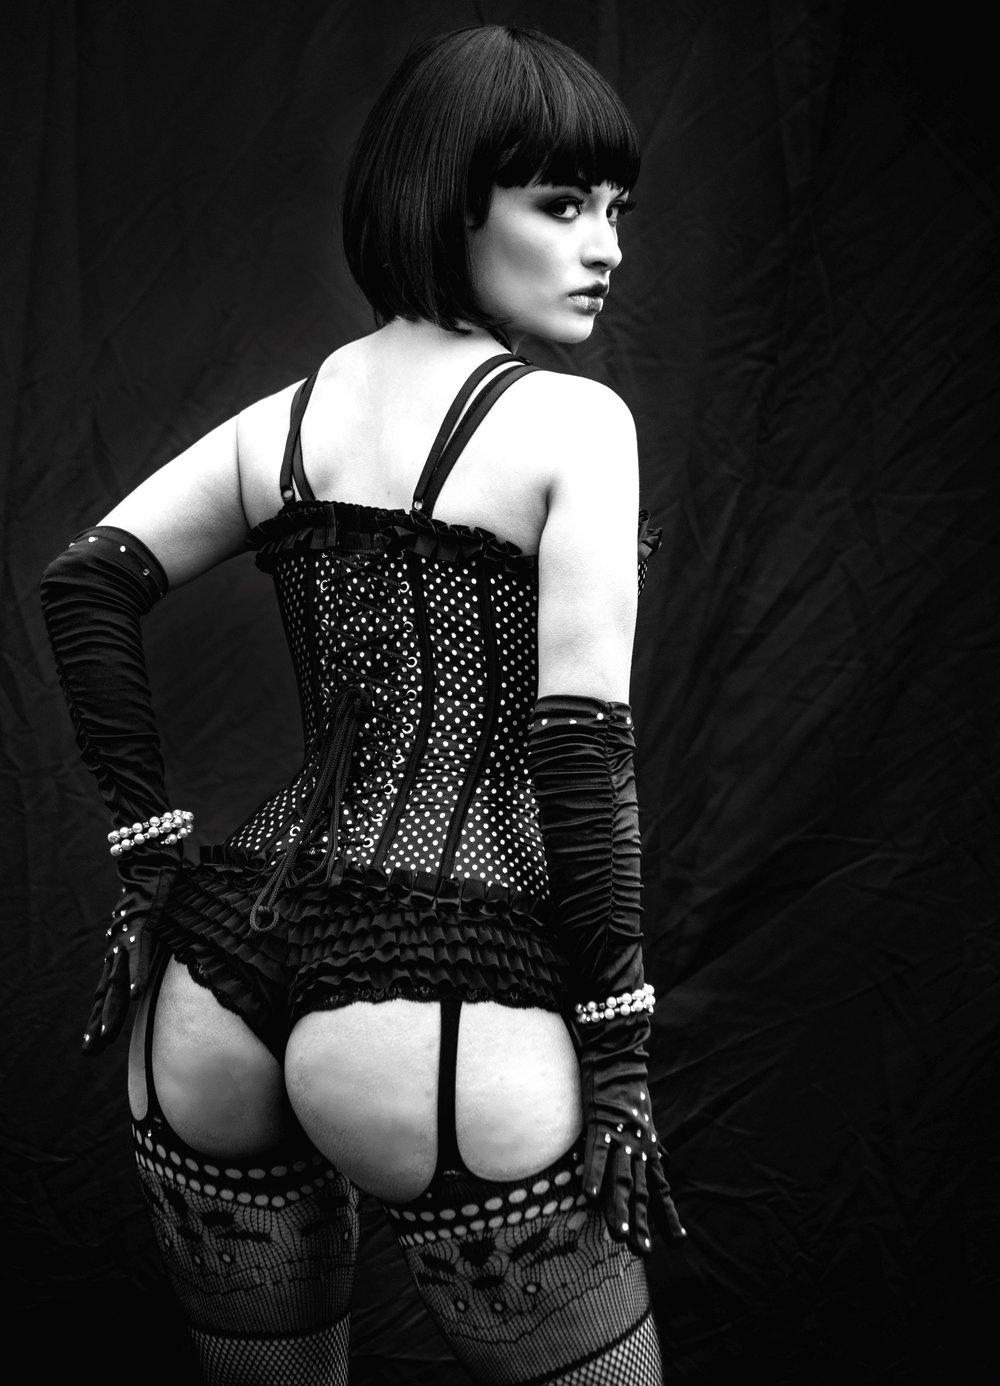 Annette Coquette (Burlesque Entertainer)